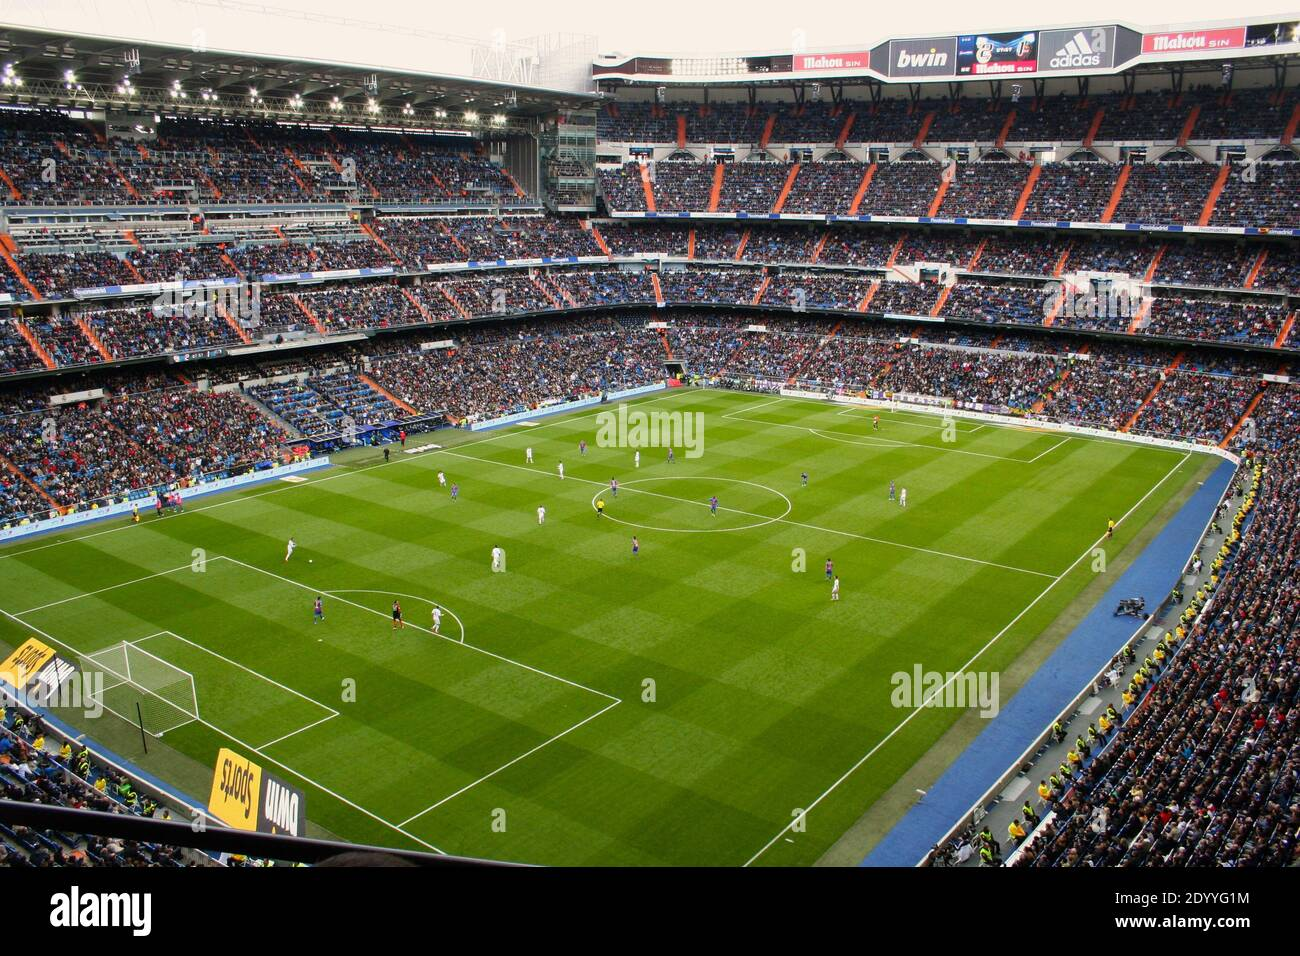 football-match-underway-between-real-madrid-v-levante-at-the-bernabeu-stadium-madrid-spain-6-april-2013-2DYYG1M.jpg